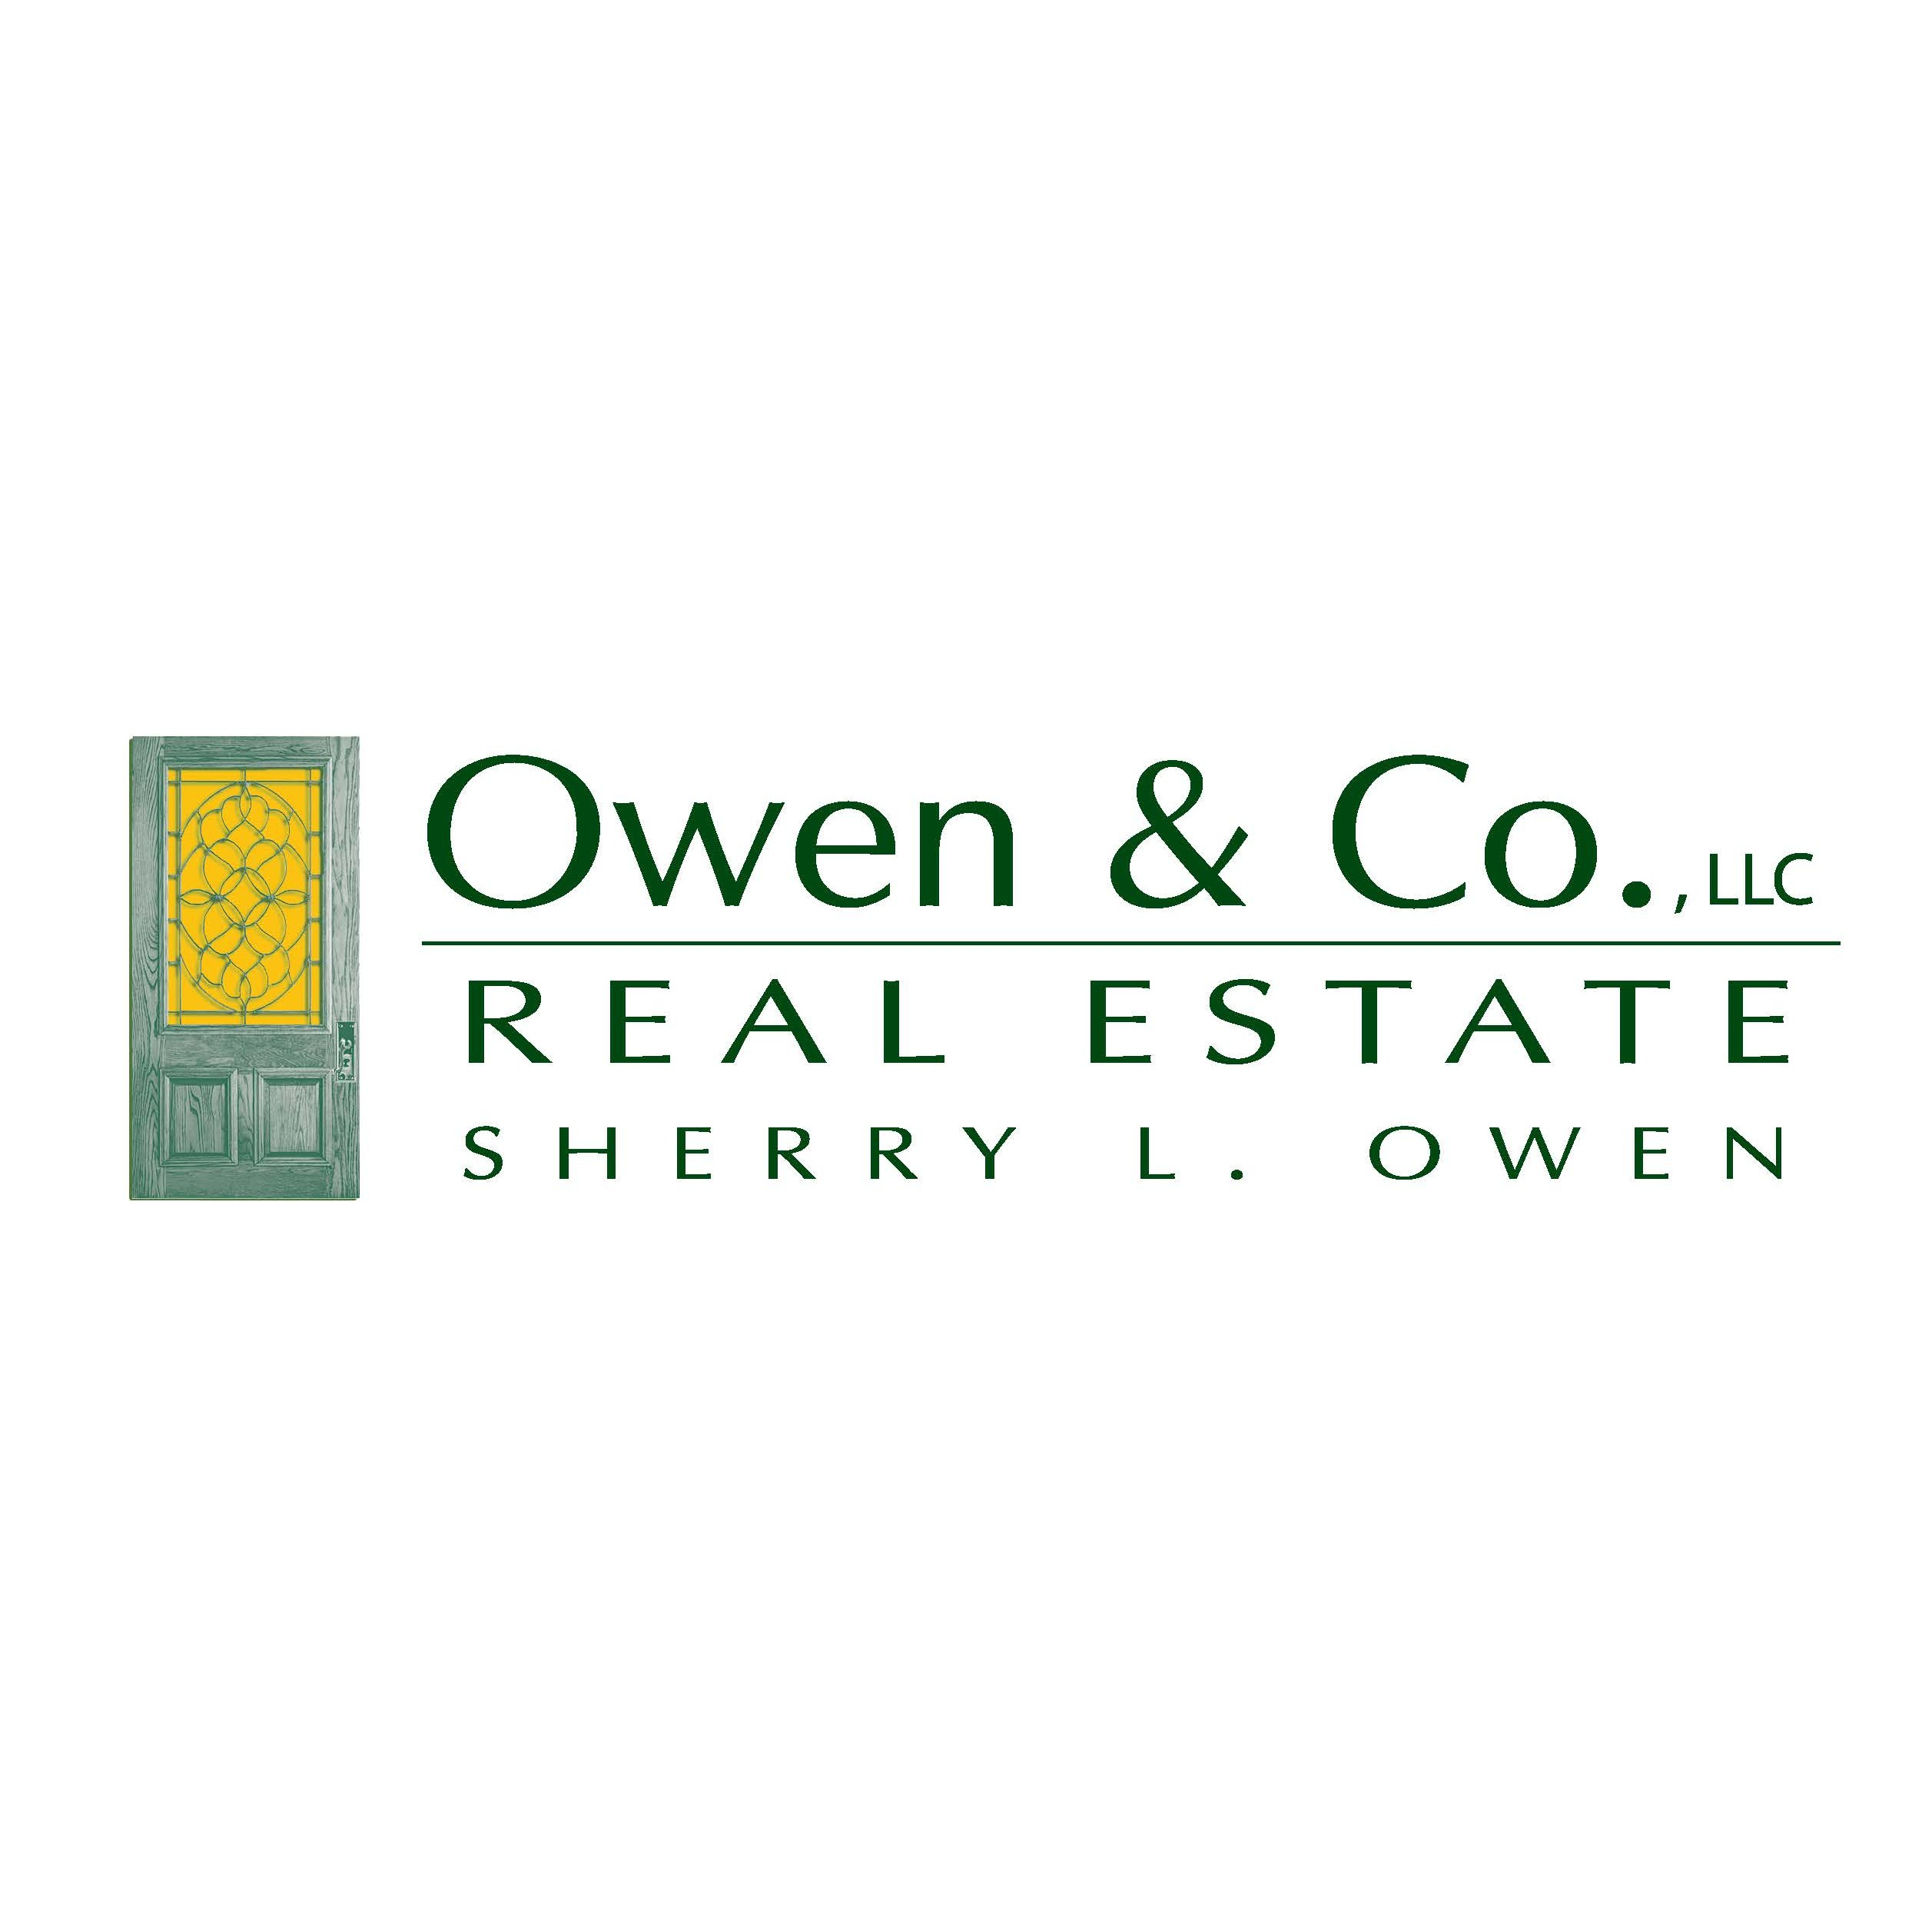 Owen & Co., LLC Real Estate